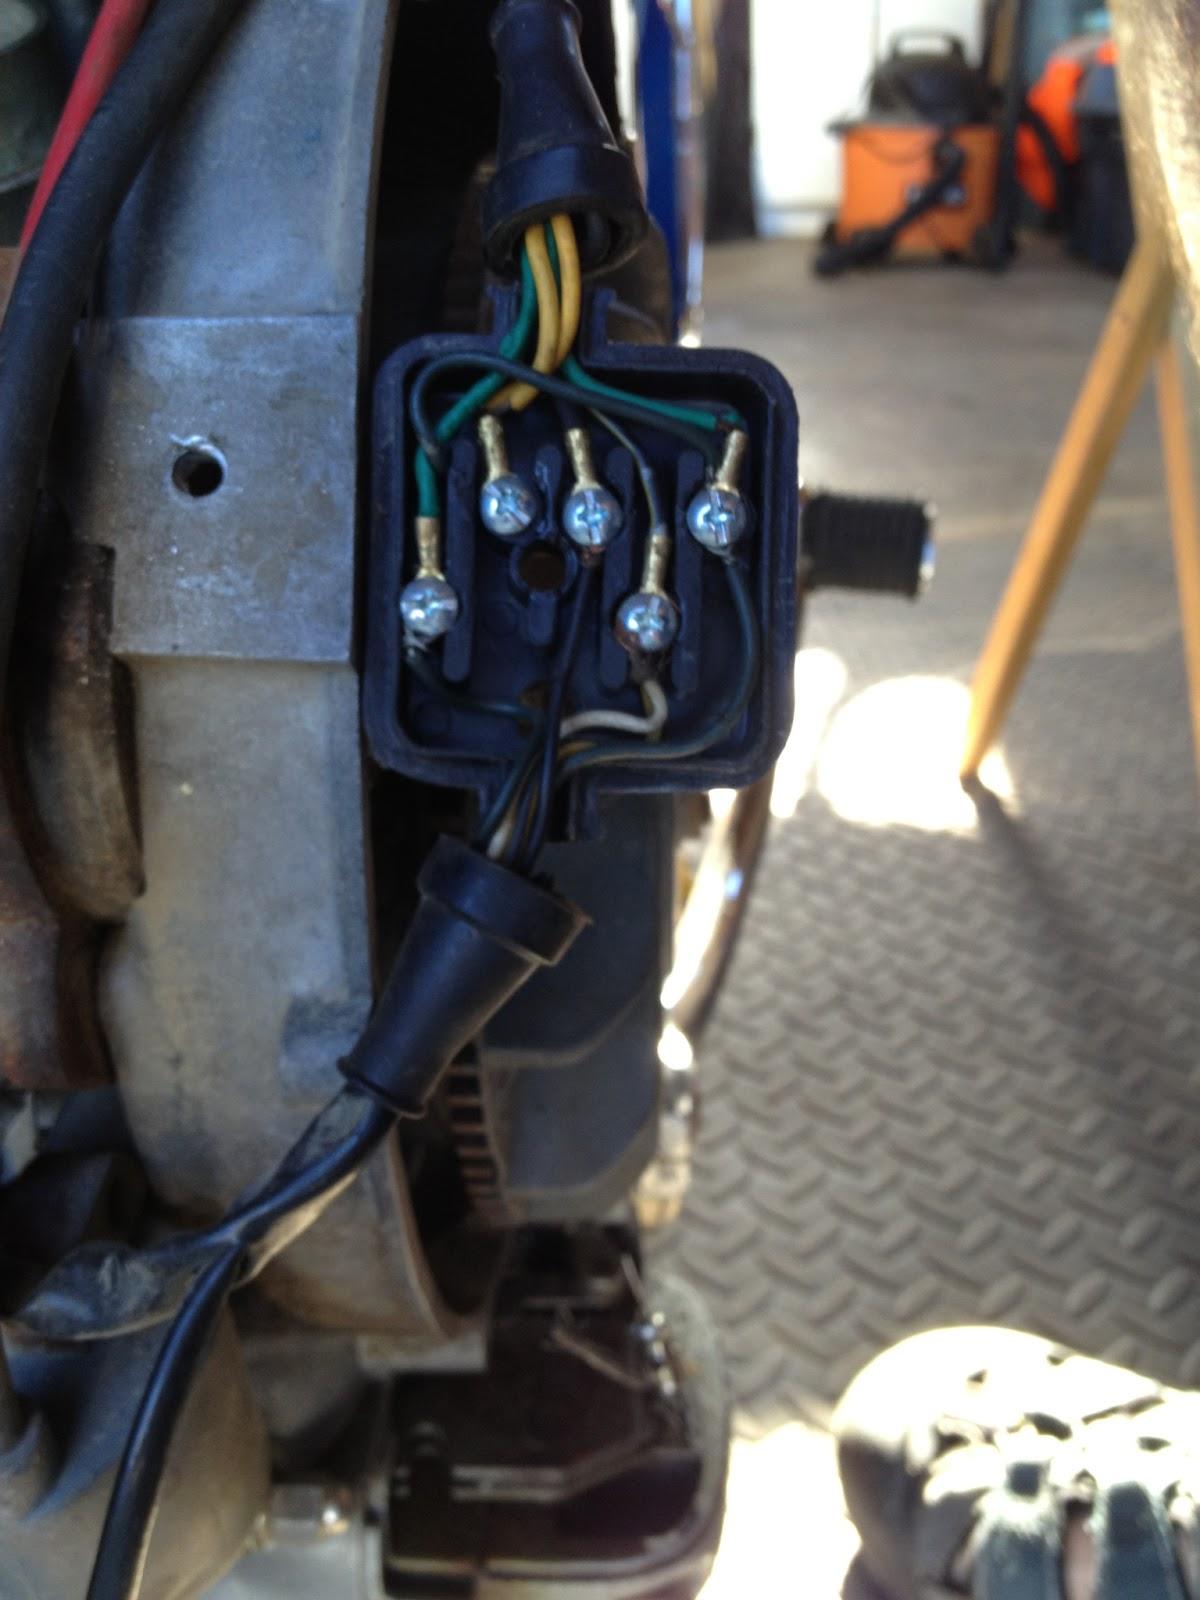 1967 Vespa Sprint 150 Vlbit Maintenance Record Wiring Junction Of Iron Box